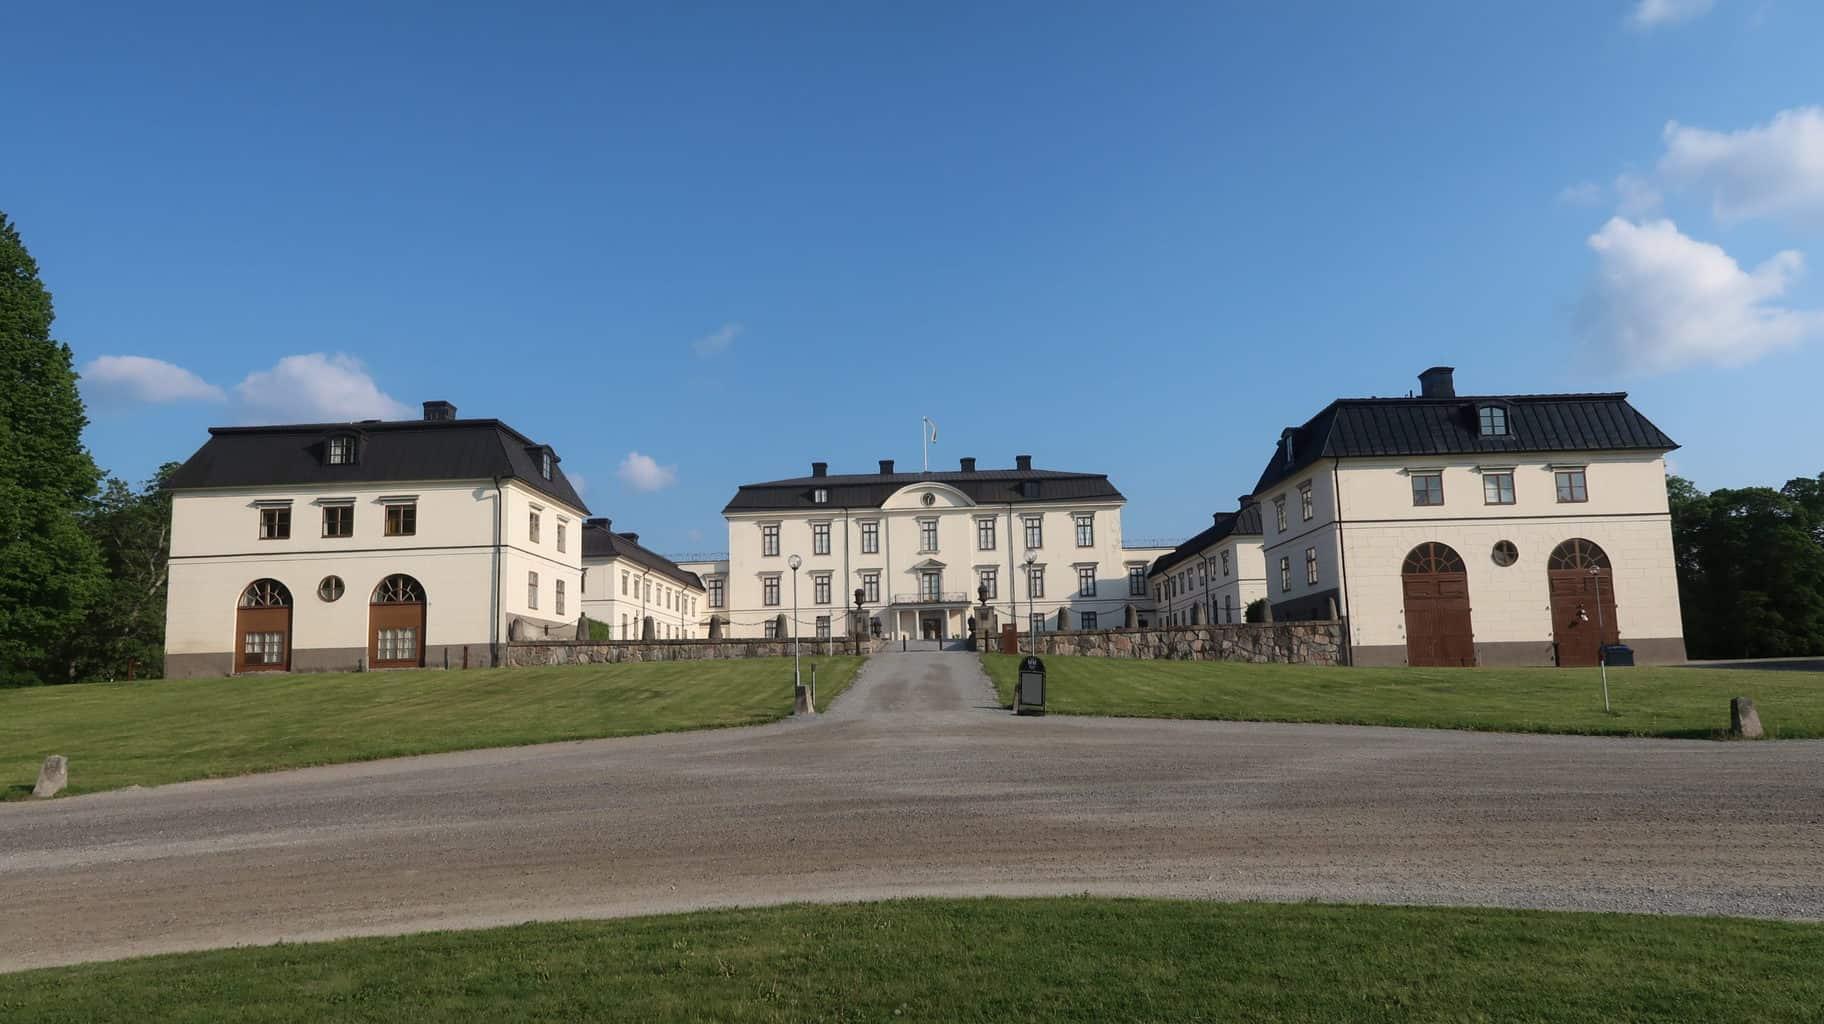 Rosersberg Castle